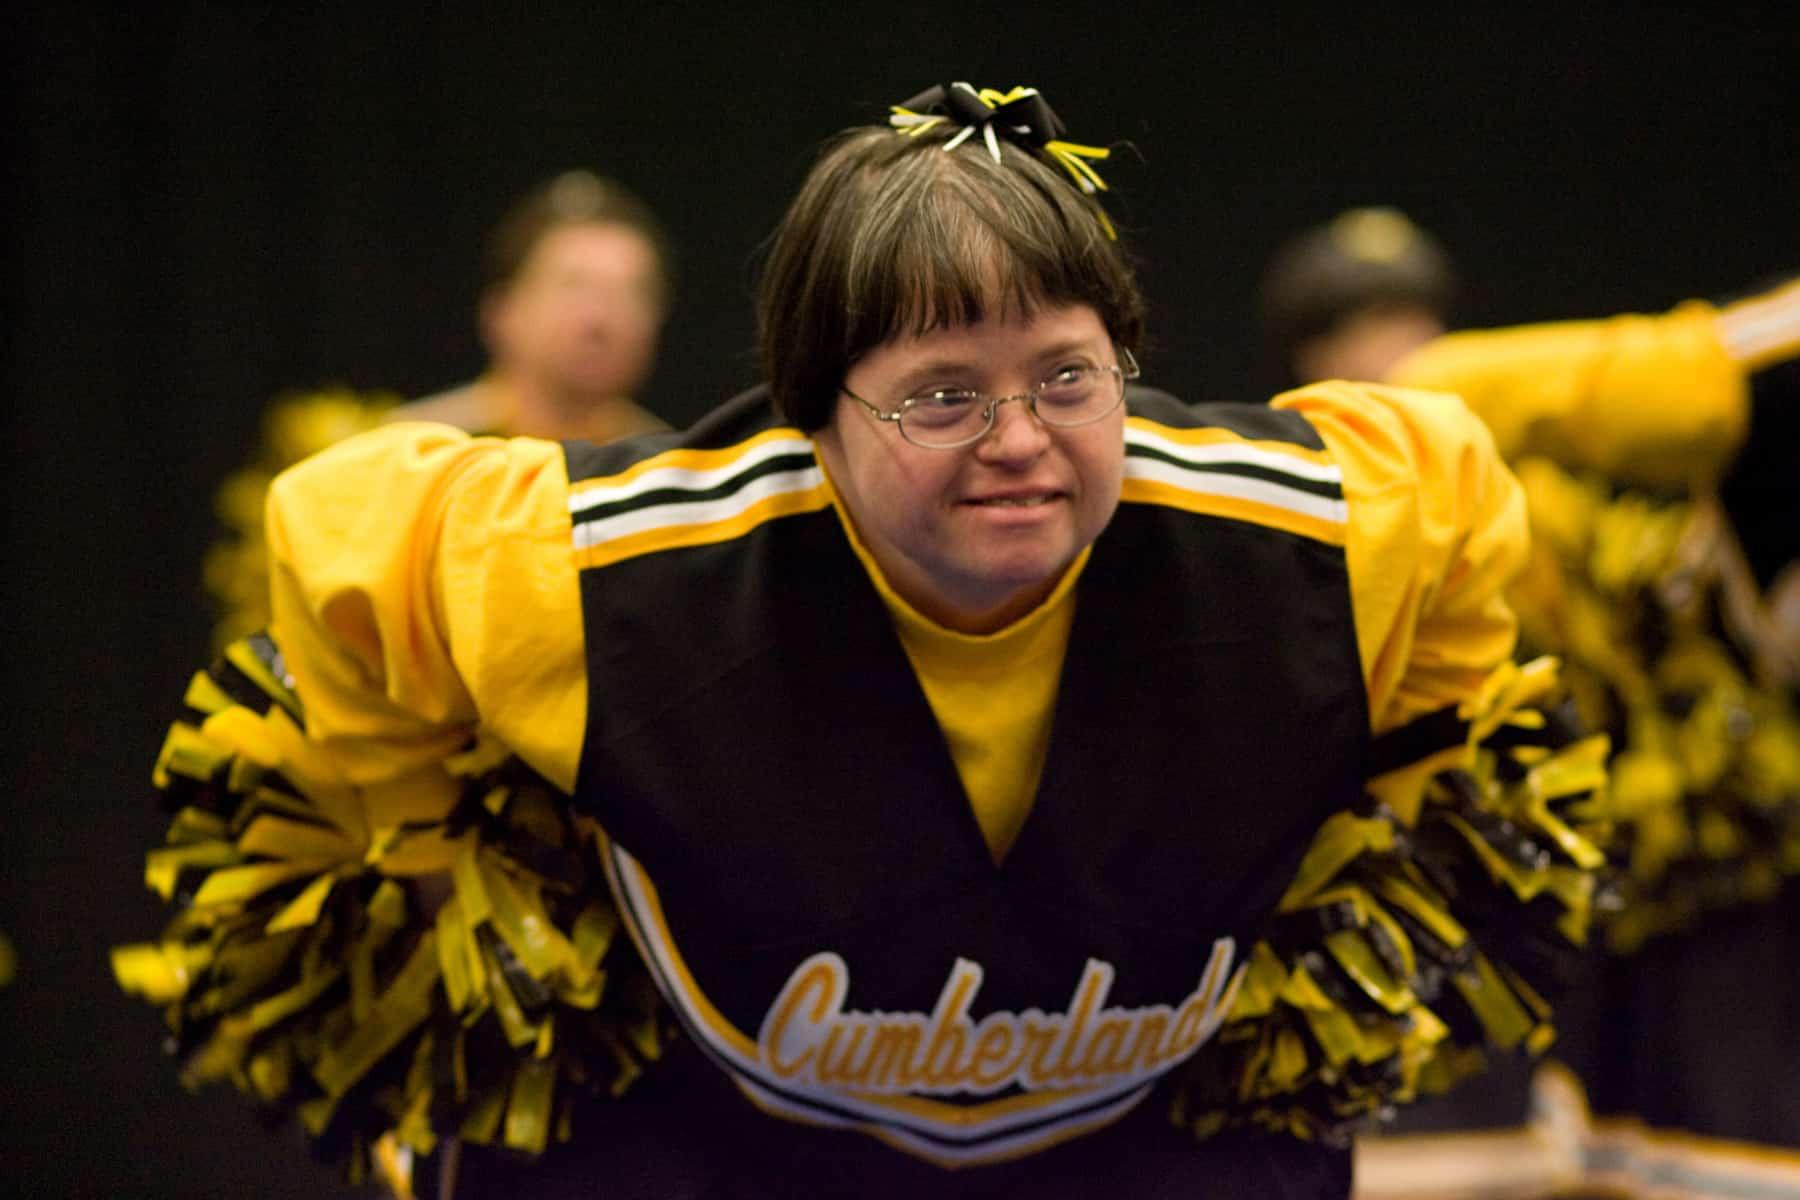 cumberland co. cheerleader